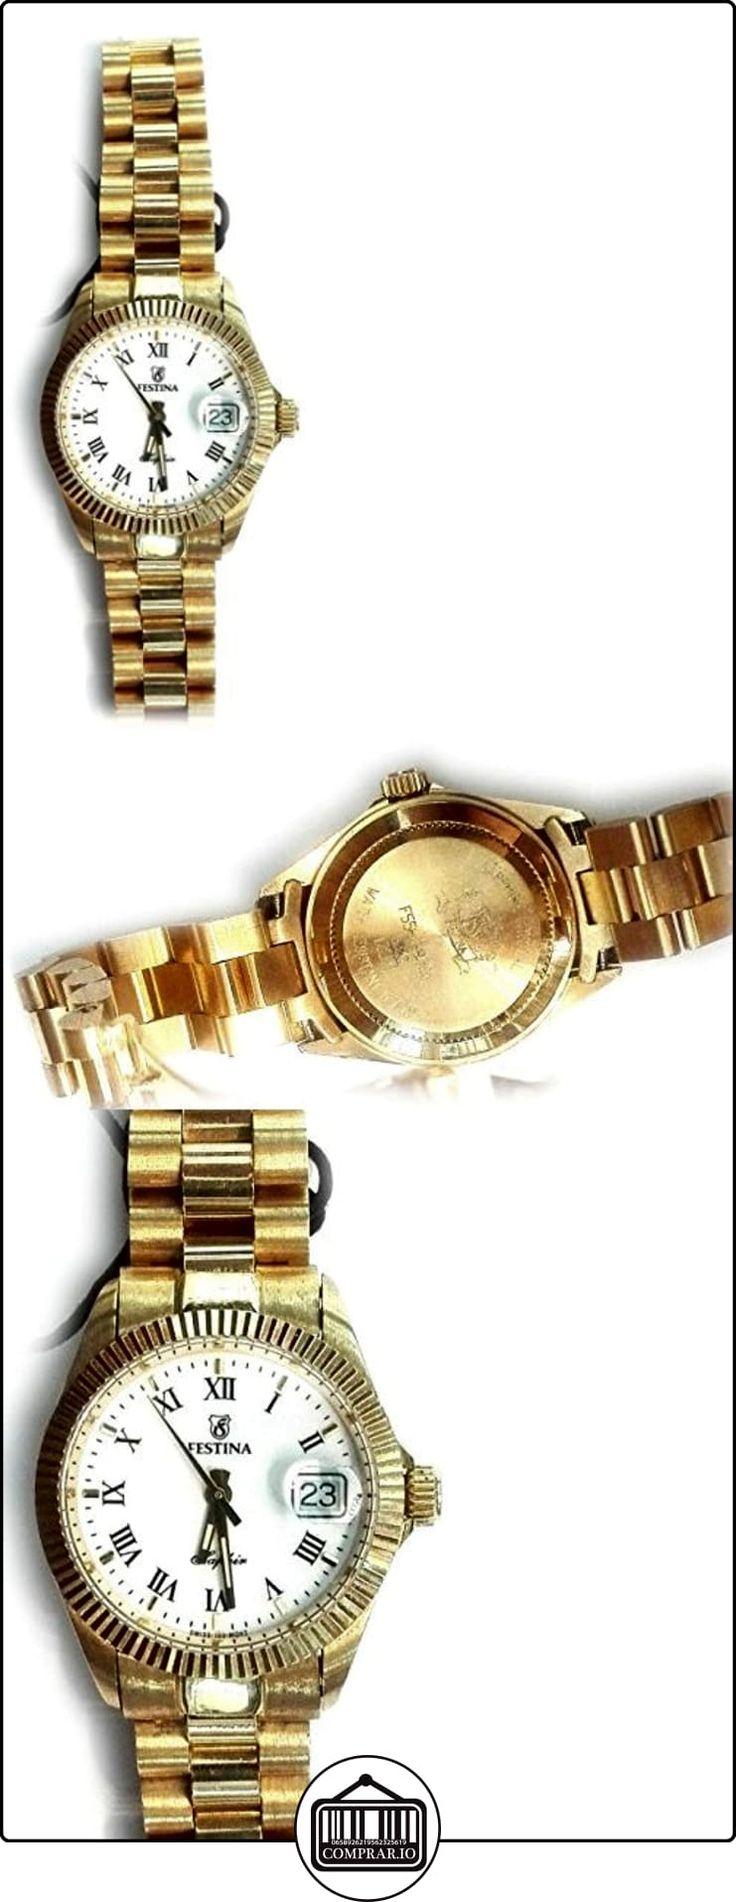 Reloj Festina Oro 18 Quilates de Señora ¡Regálaselo! de  ✿ Relojes para mujer - (Lujo) ✿